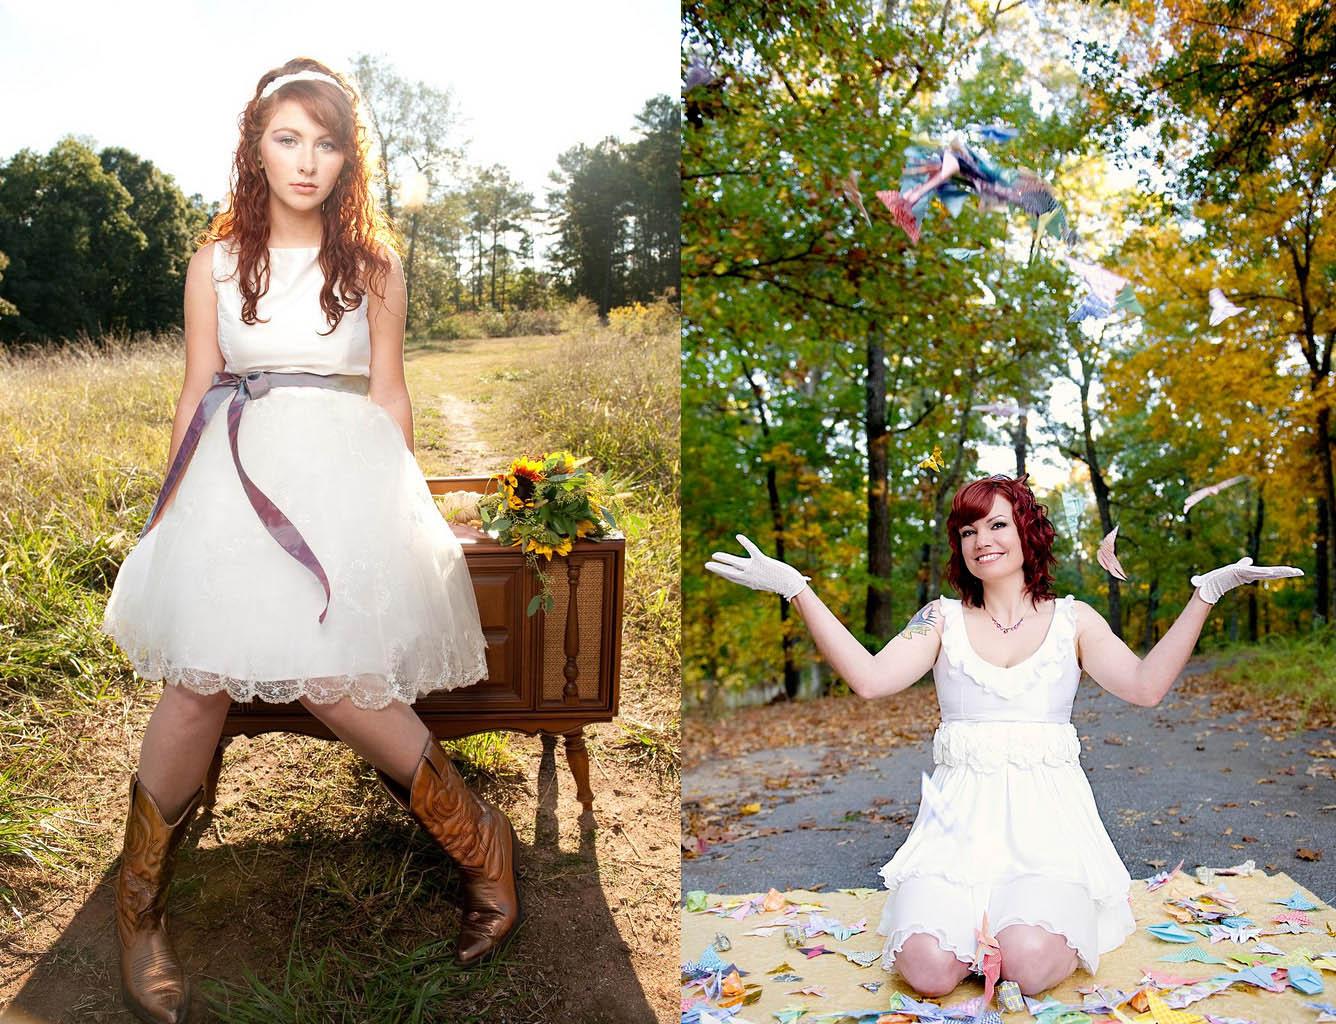 Wedding Dress Ideas: DevilInspired Wedding Dresses: Wedding Dress Ideas For